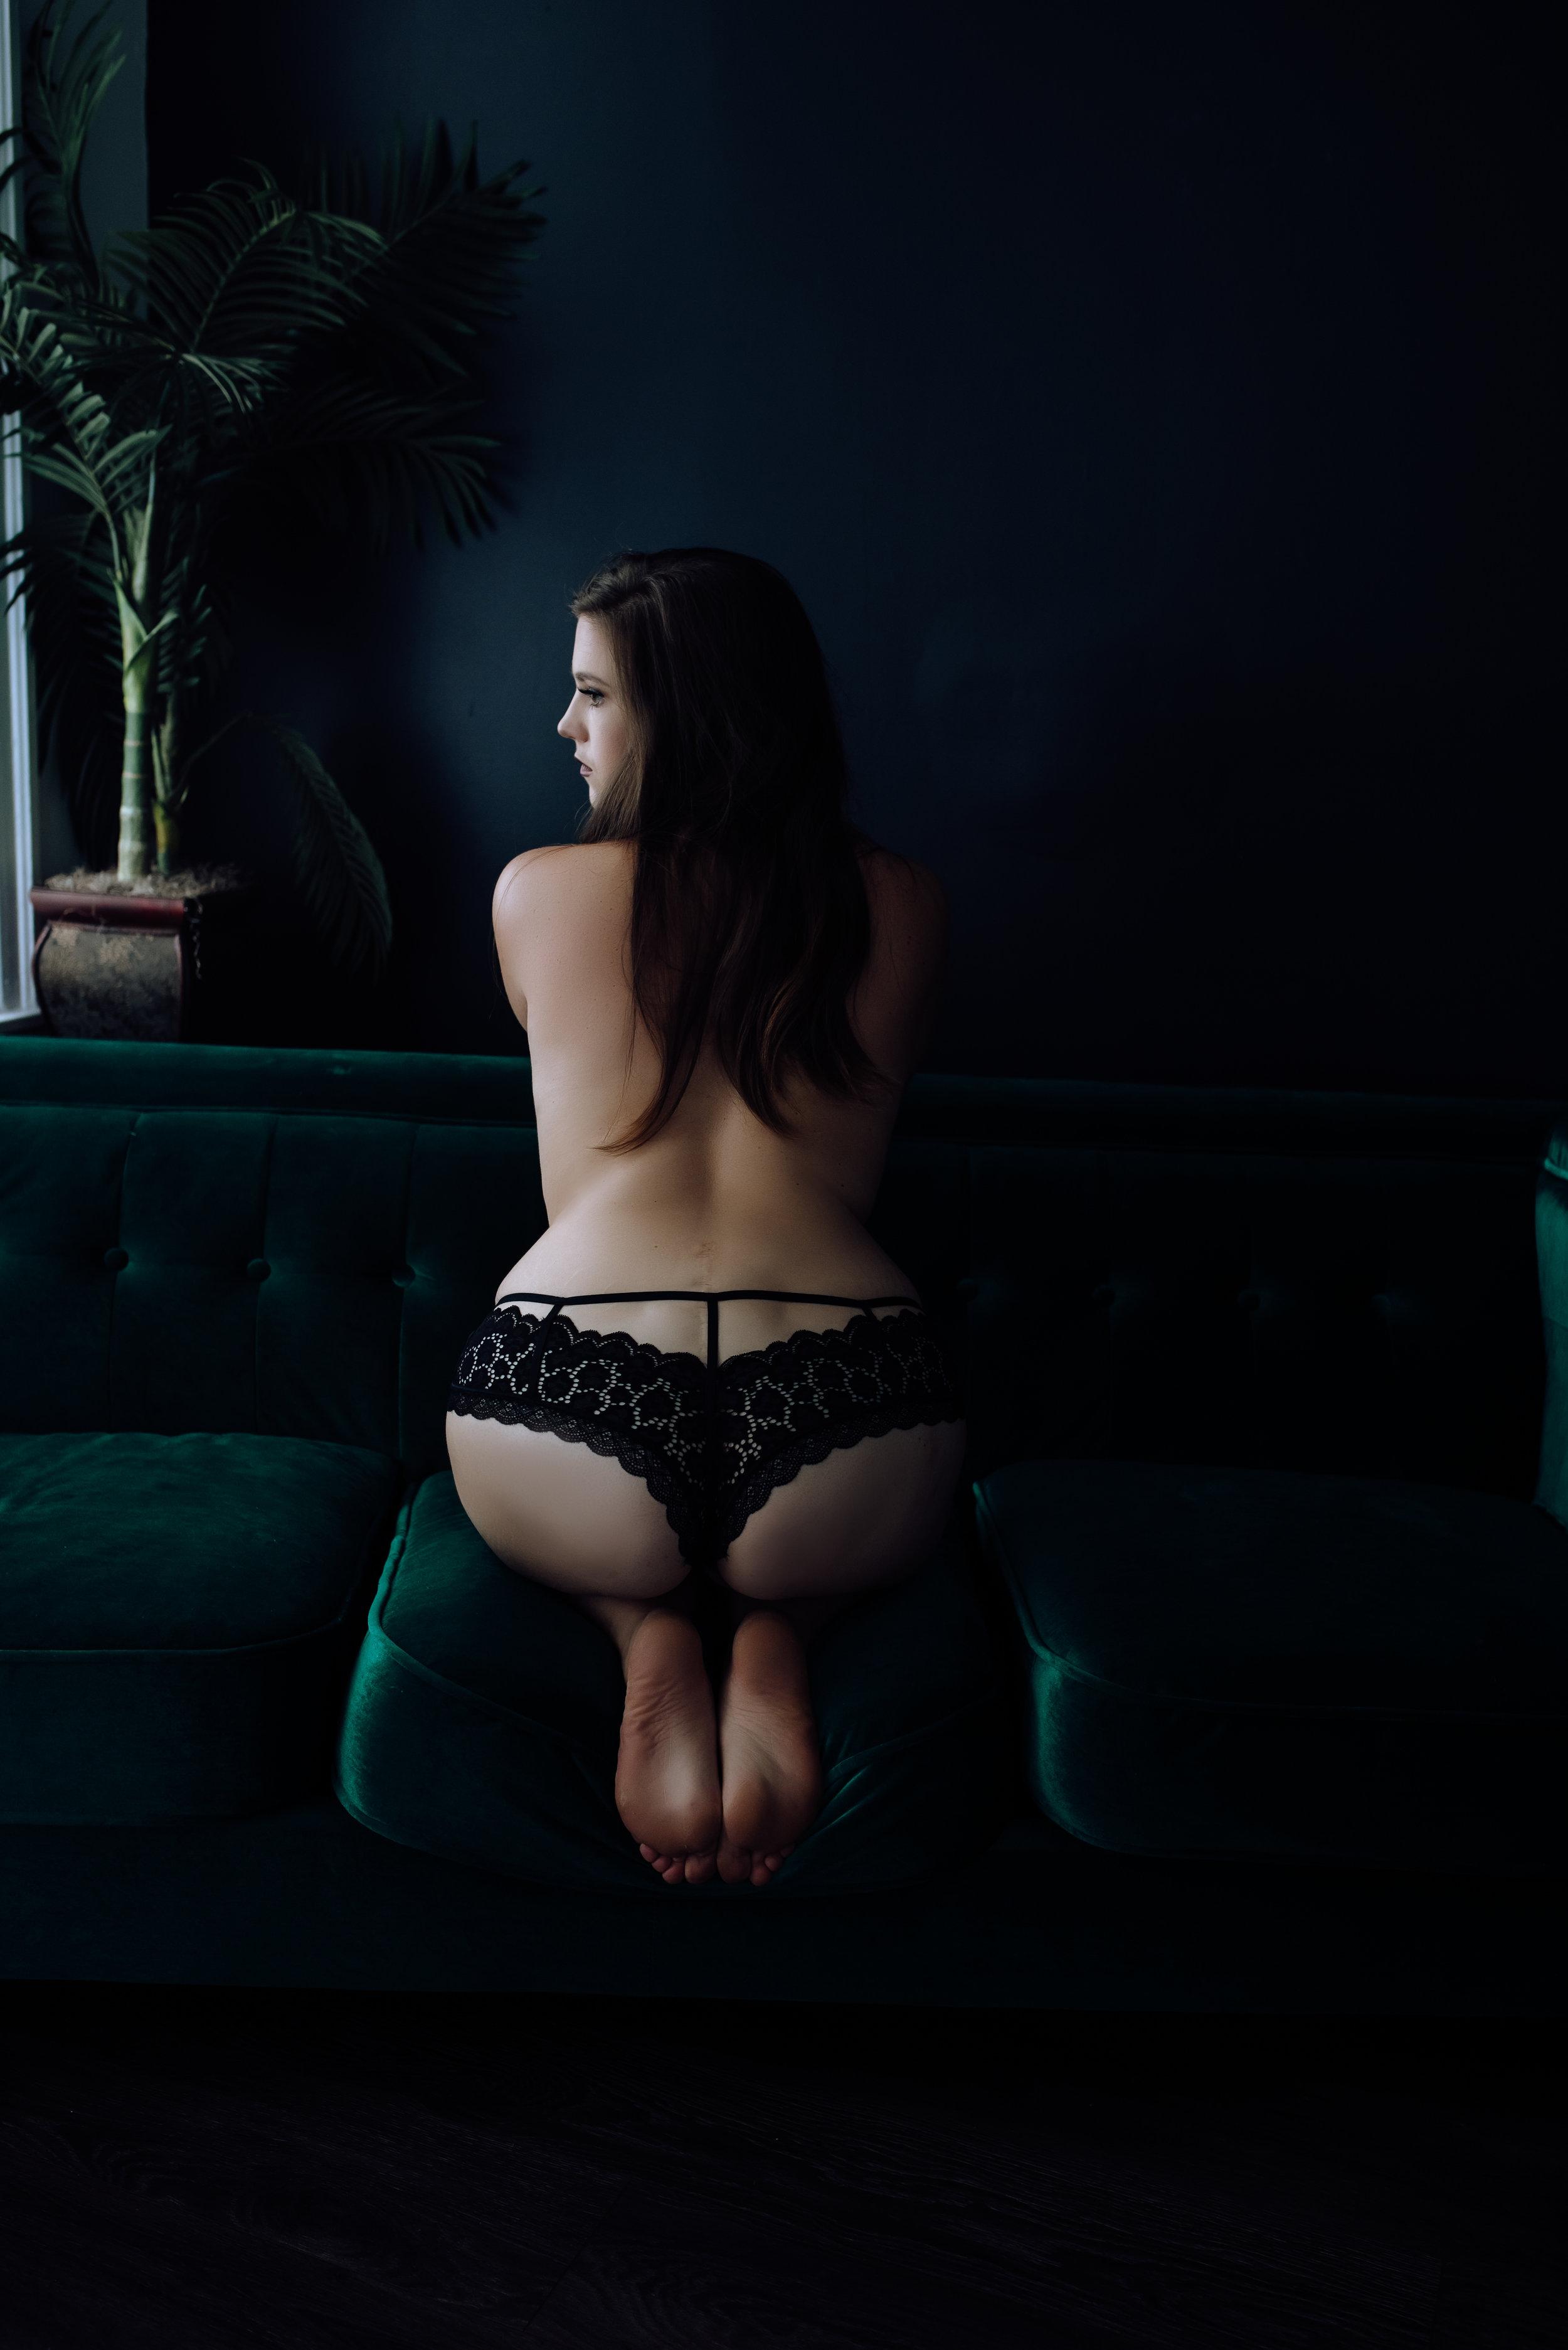 boudoir-photography-best-in-berks-30.jpg